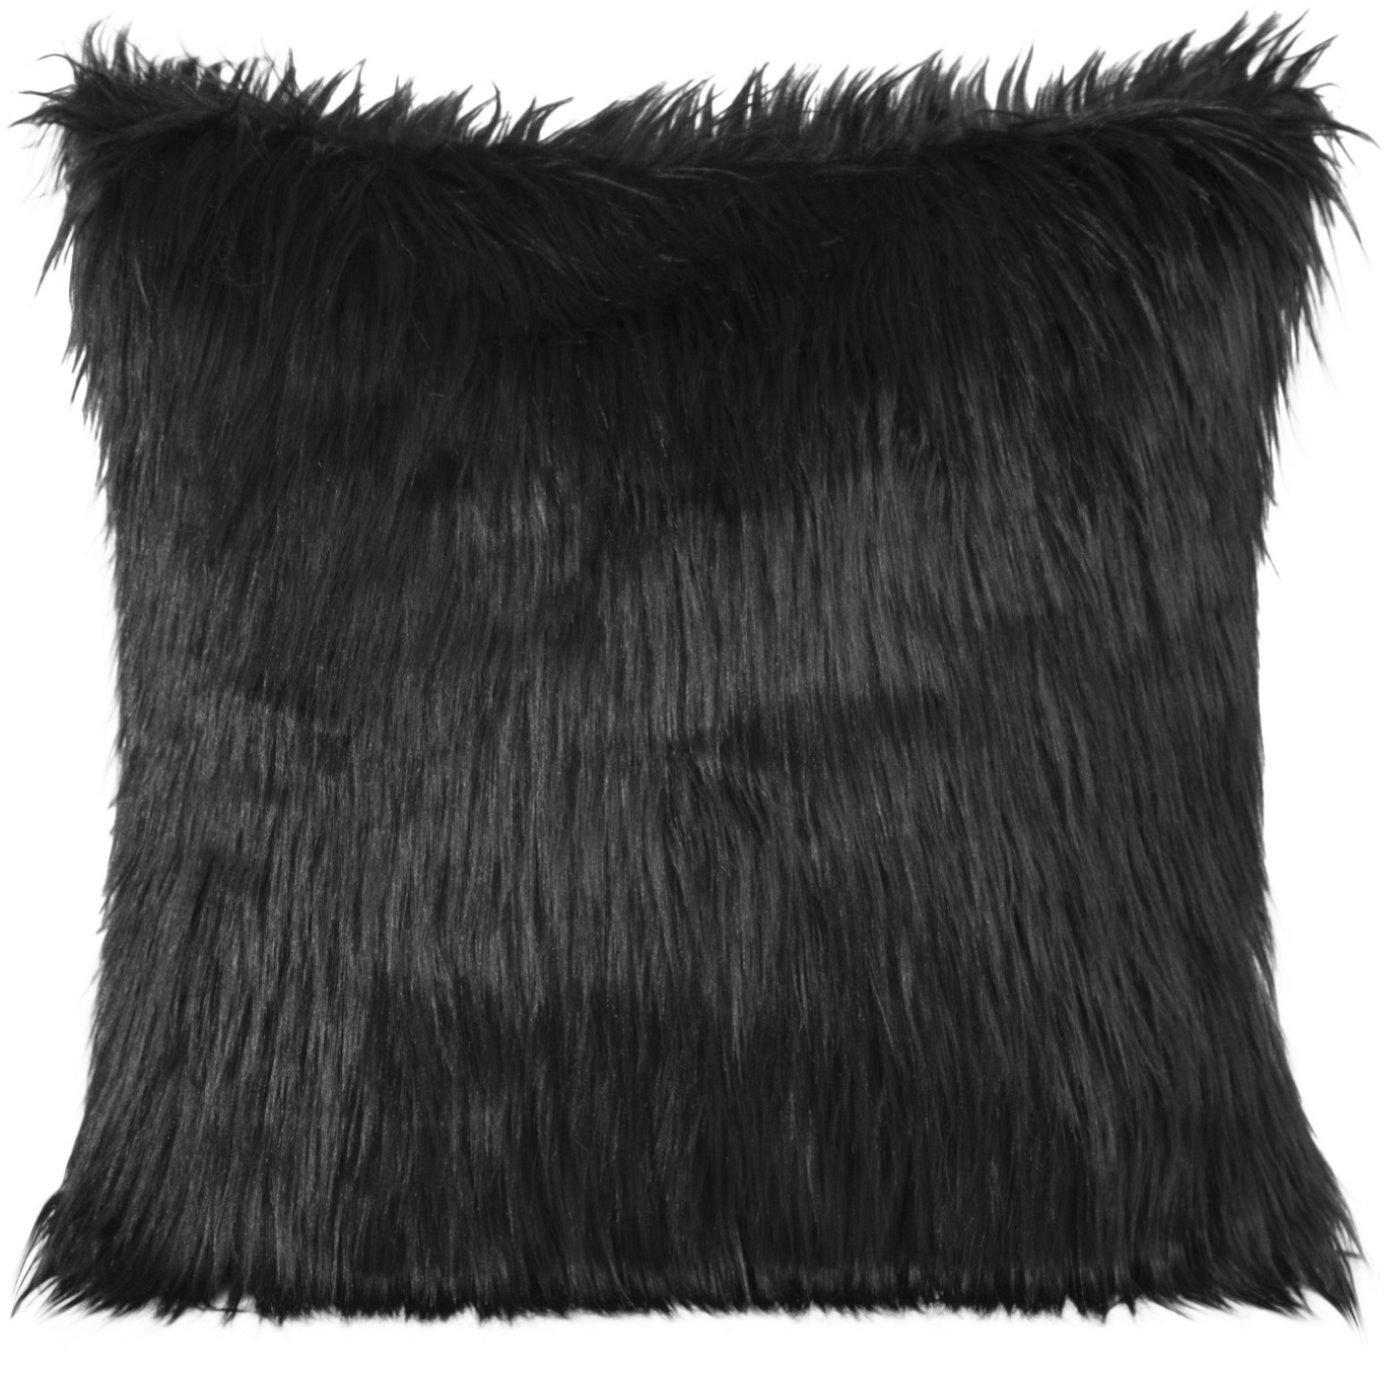 Poszewka na poduszkę futerko czarna 55 x 55 cm